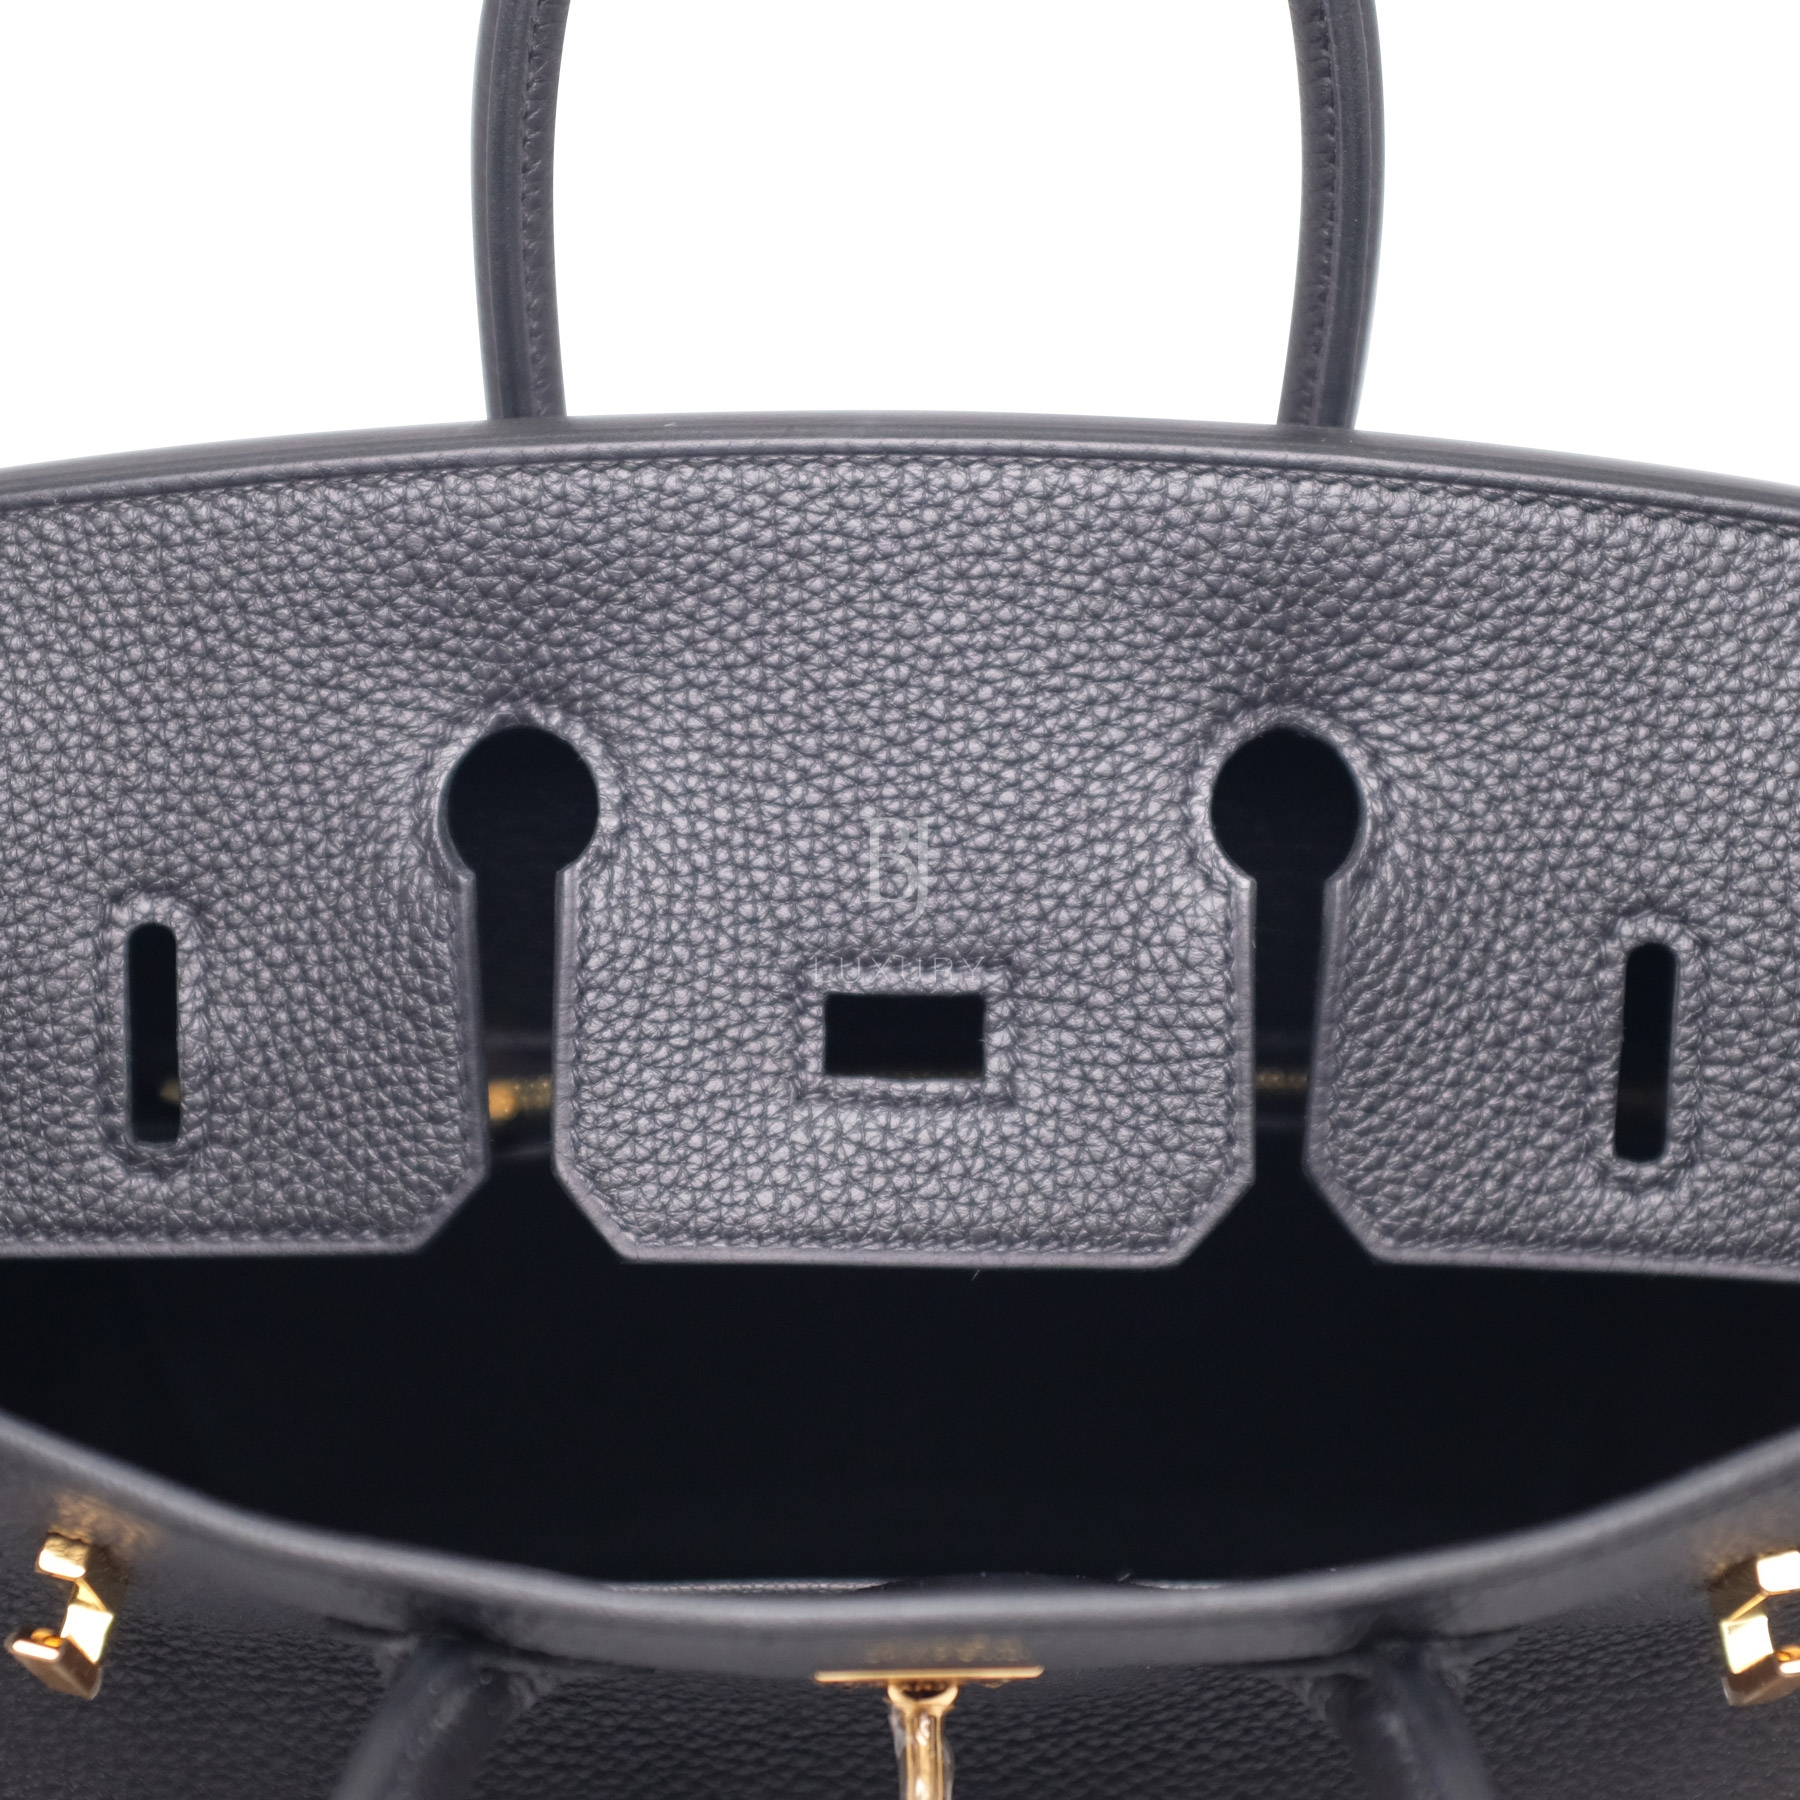 Hermes Birkin 25 Black Togo Gold Hardware BJ Luxury 1.jpg